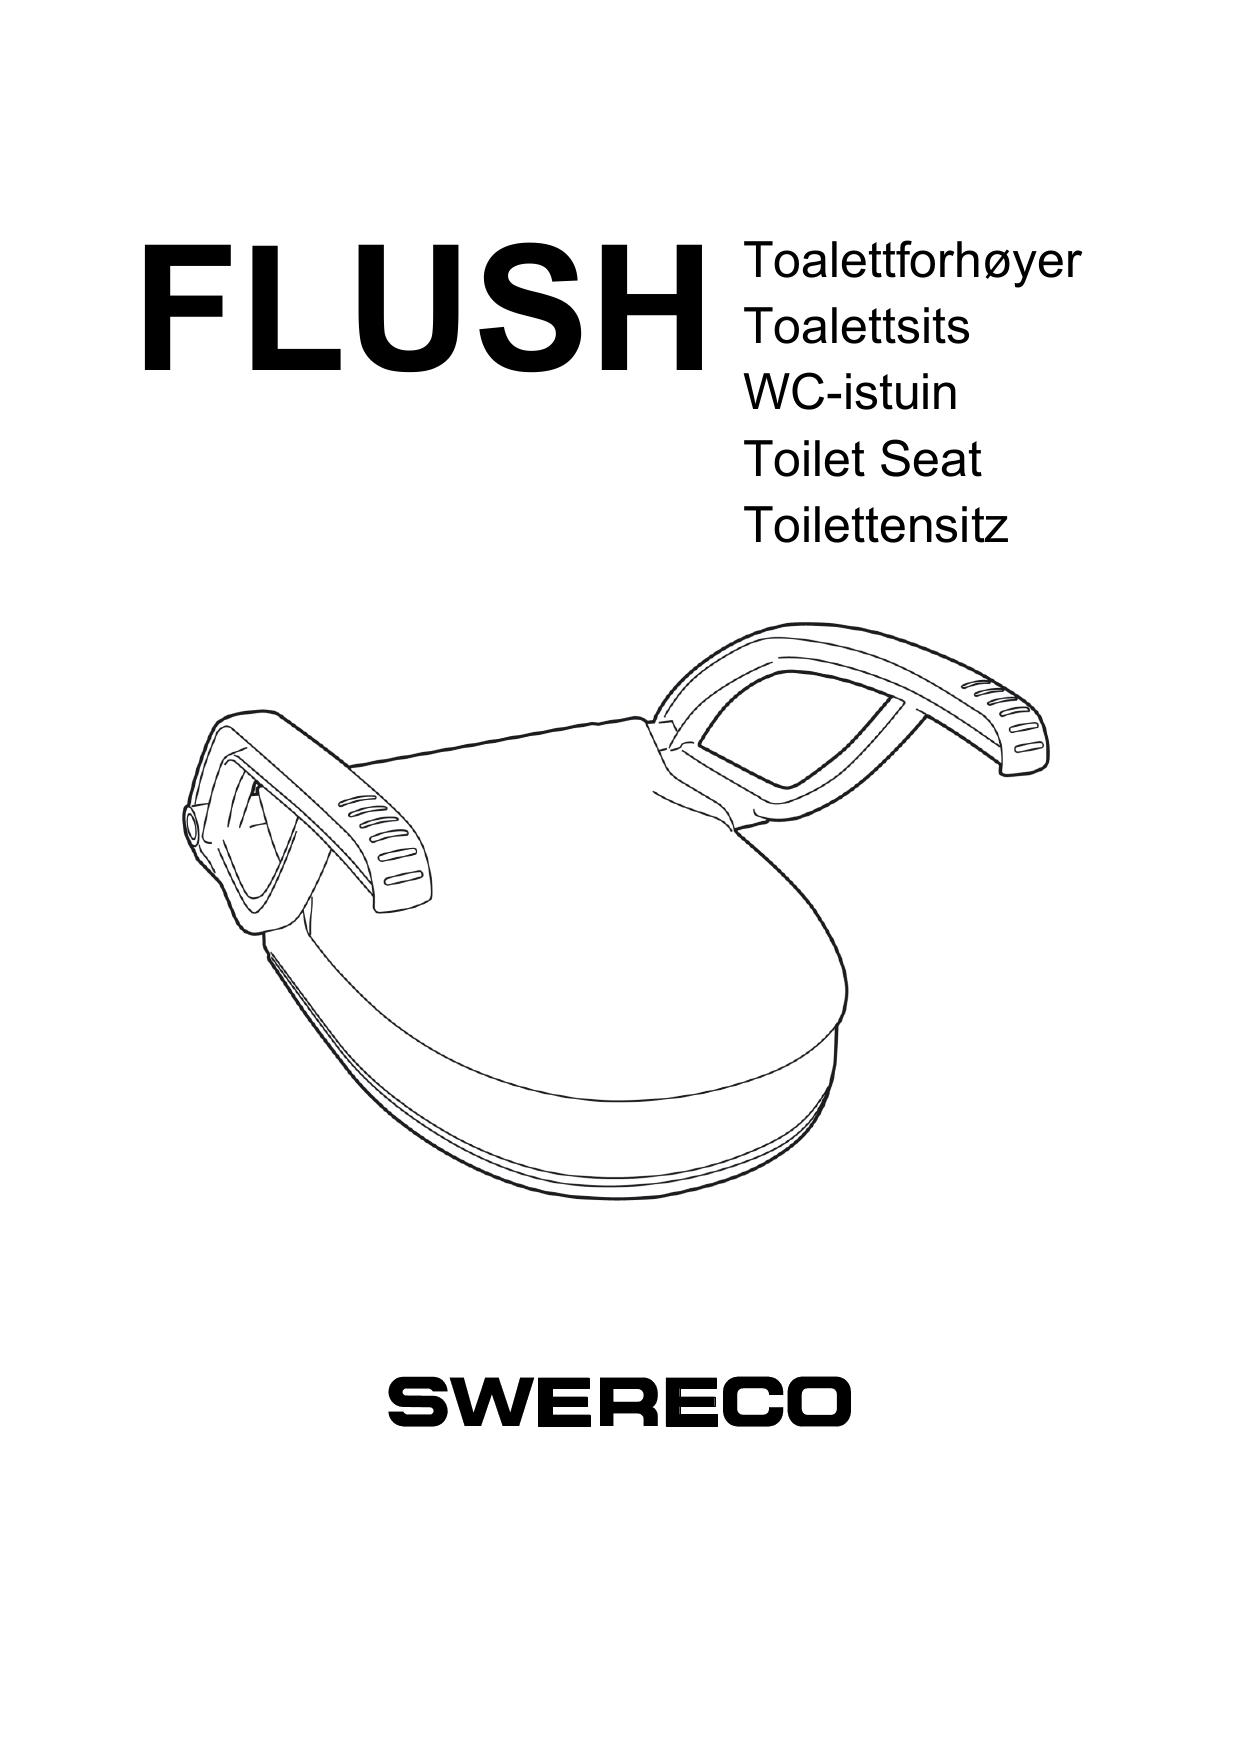 Flush Toalettforhoyer Toalettsits Wc Istuin Toilet Seat Manualzz Com